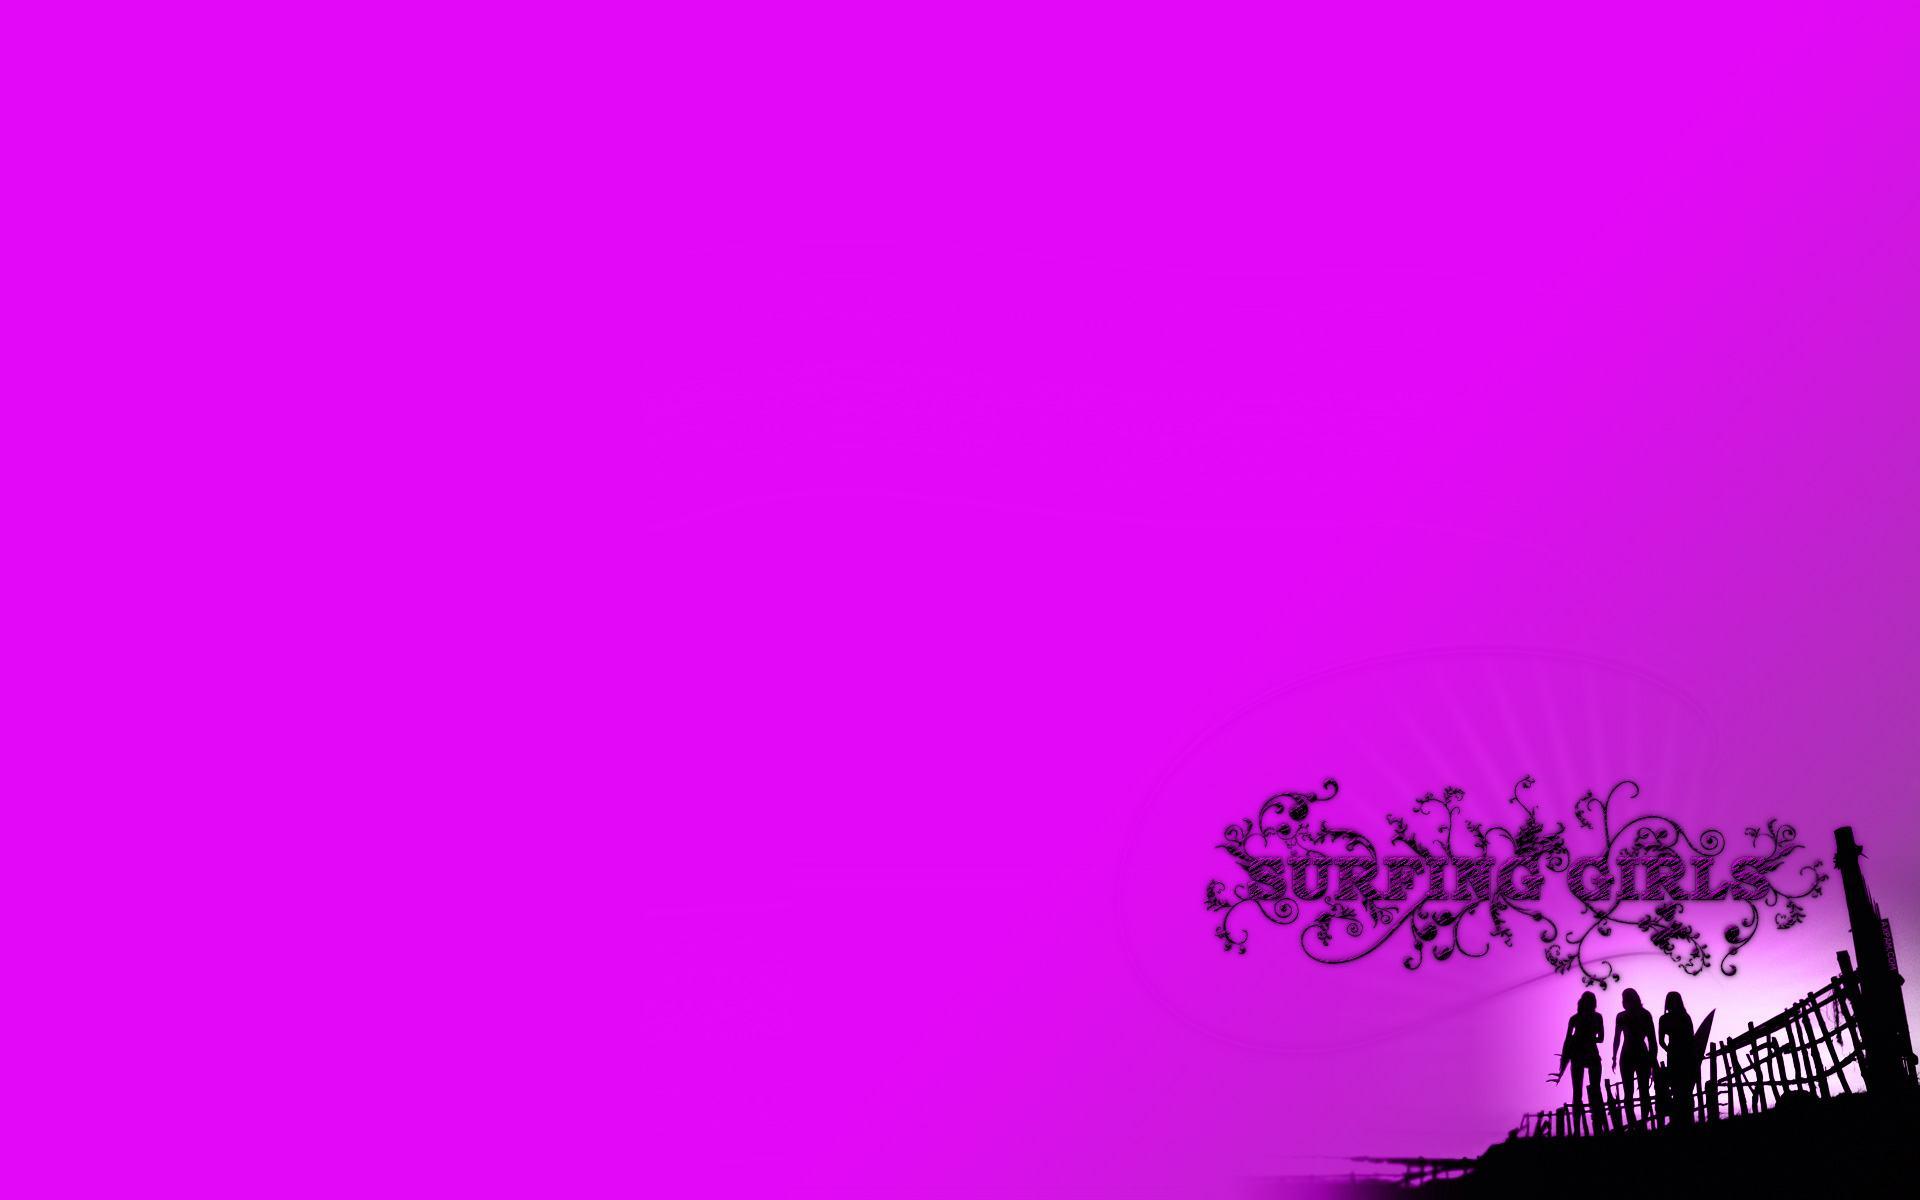 Wallpapers Surfing Pink Girls 162977